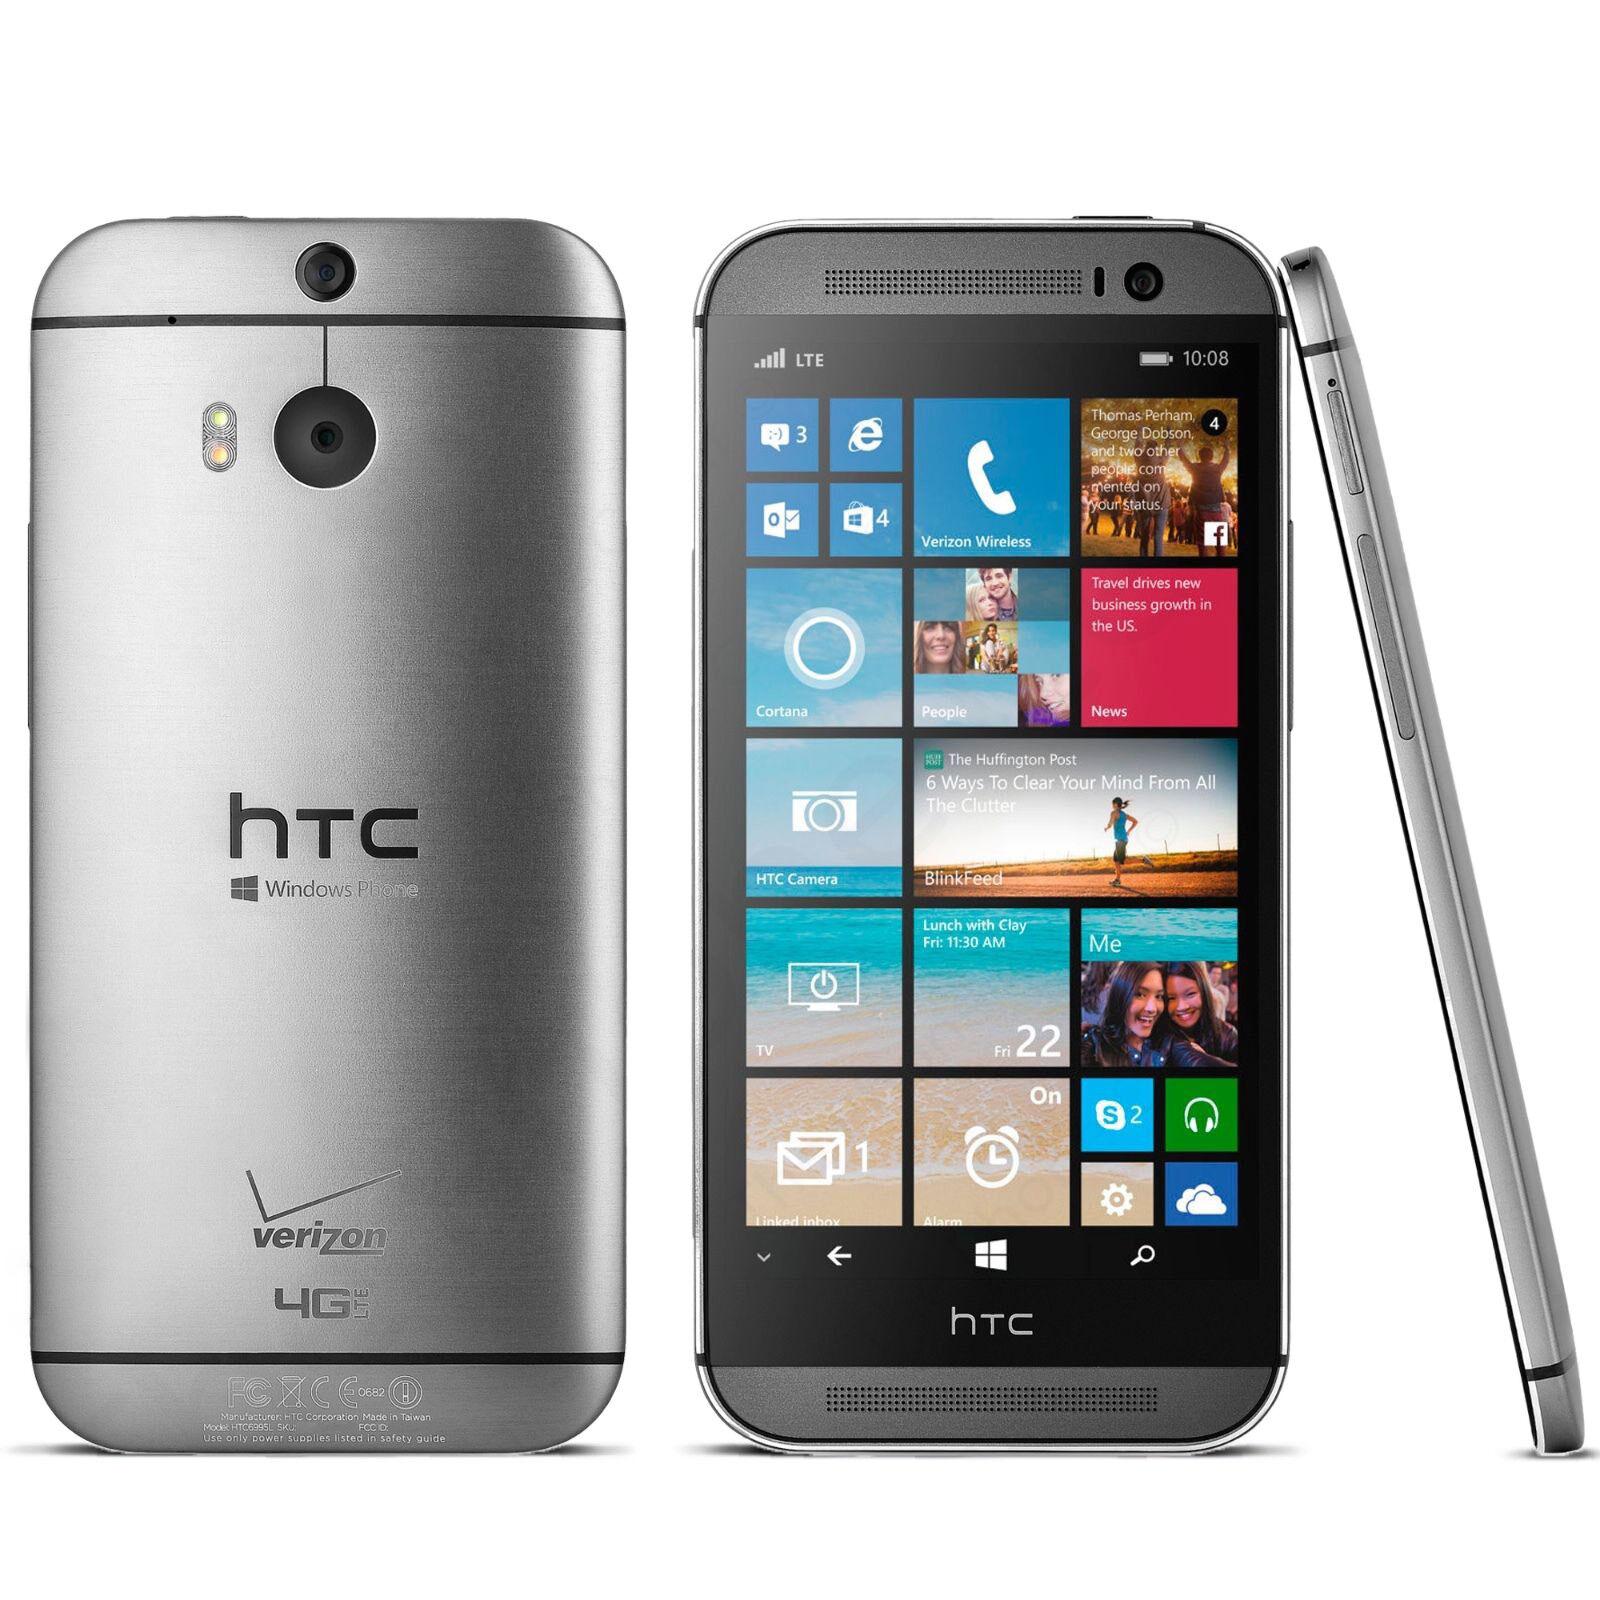 Htc One - Unlocked-Verizon-HTC-One-M8-Gunmetal-Gray-6995L-GSM-LTE-Windows-Smartphone